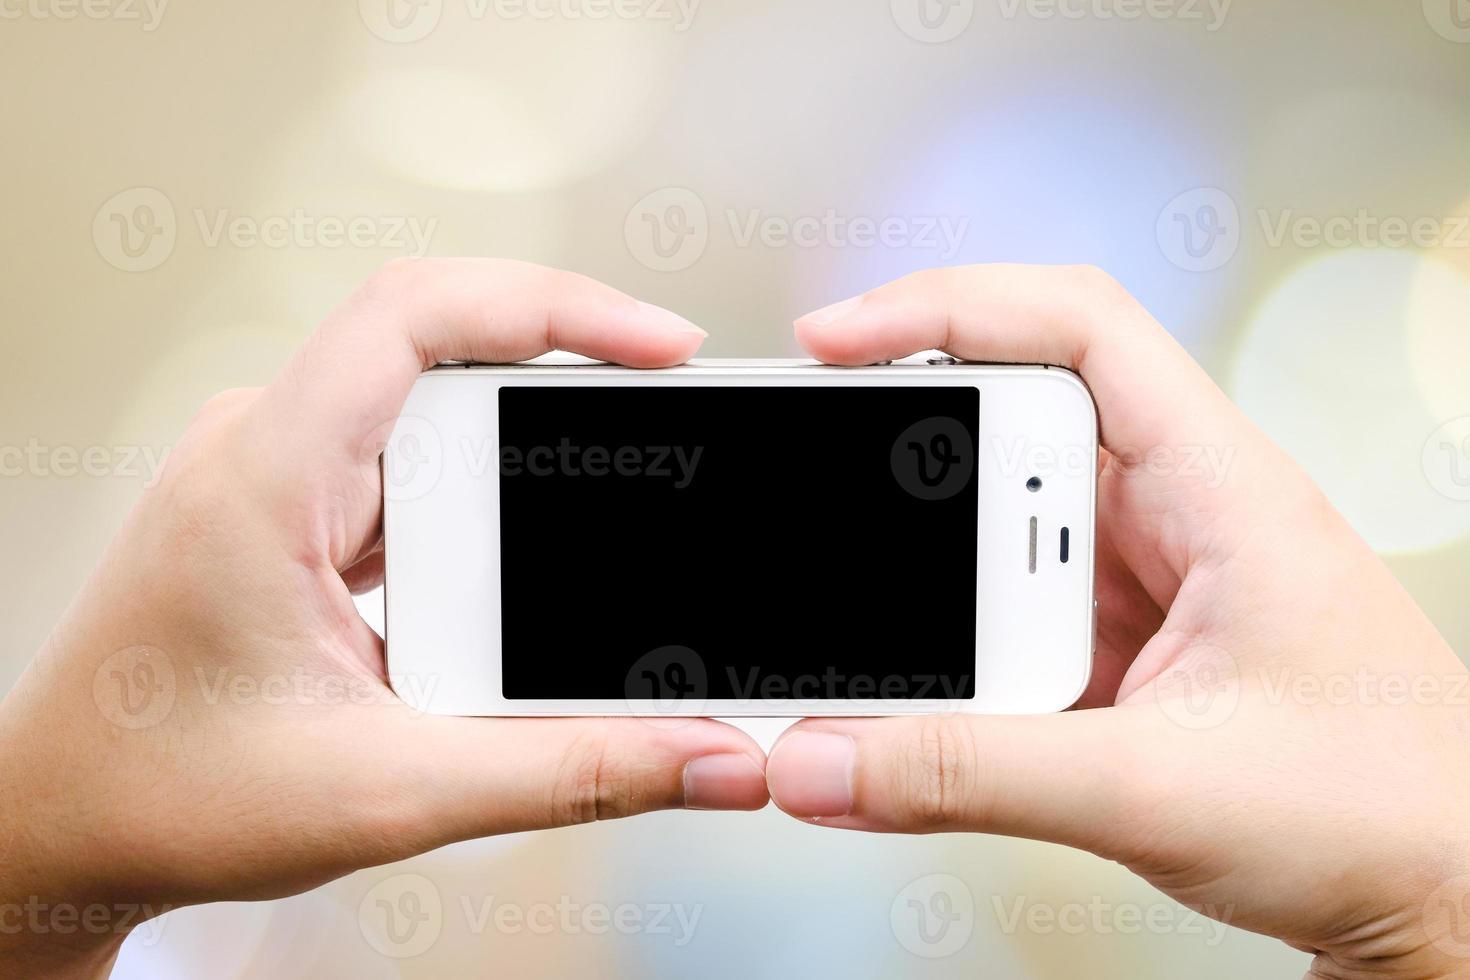 smart telefon i handen på bokeh bakgrund foto